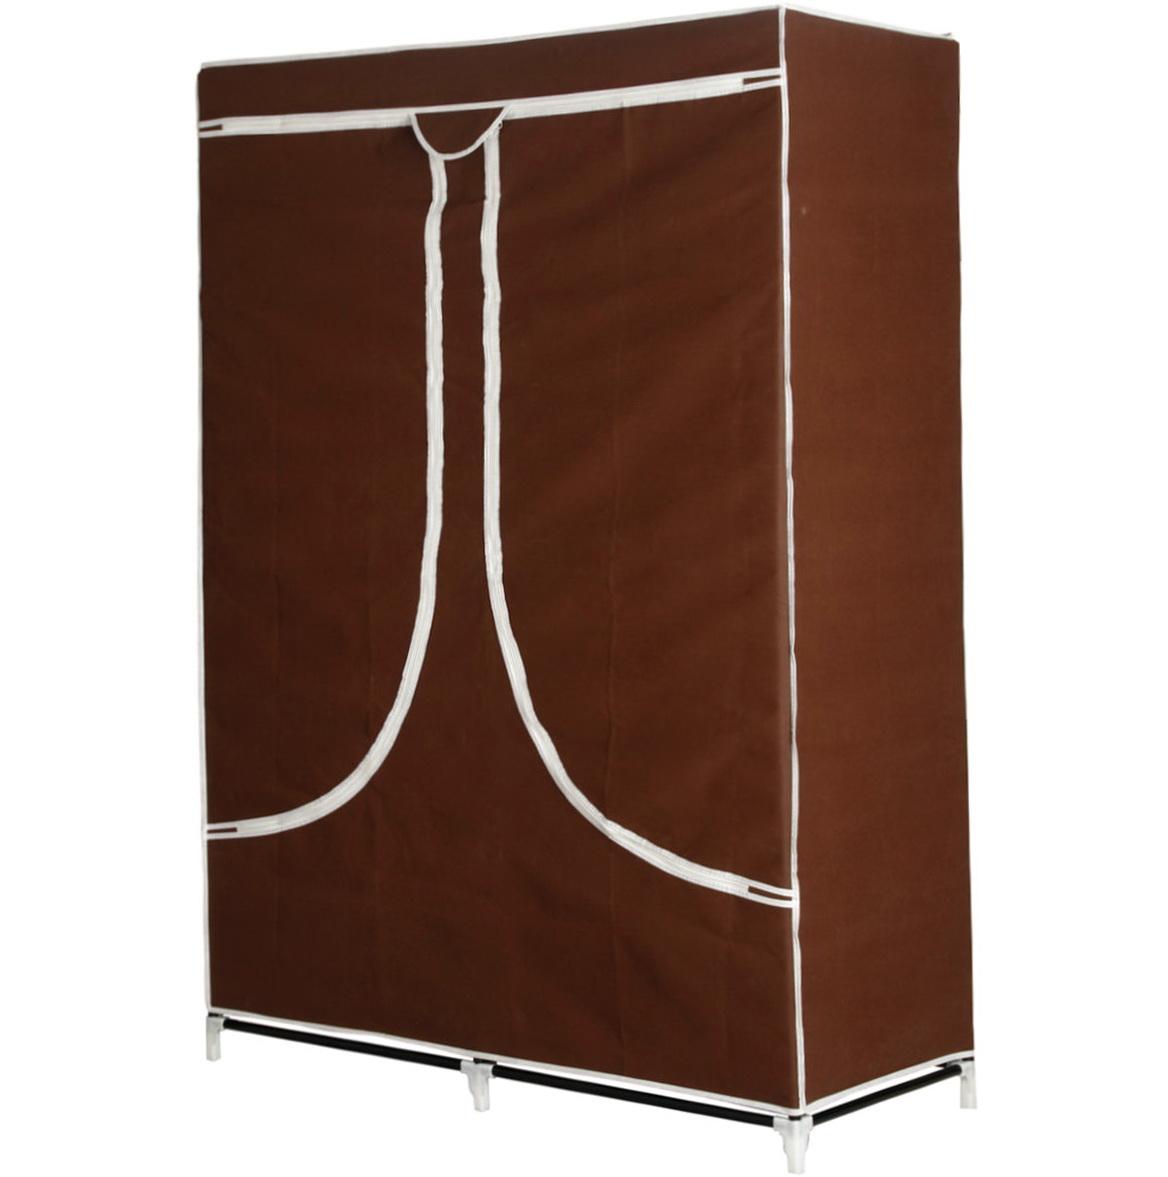 Portable Wardrobe Closet Walmart Home Design Ideas